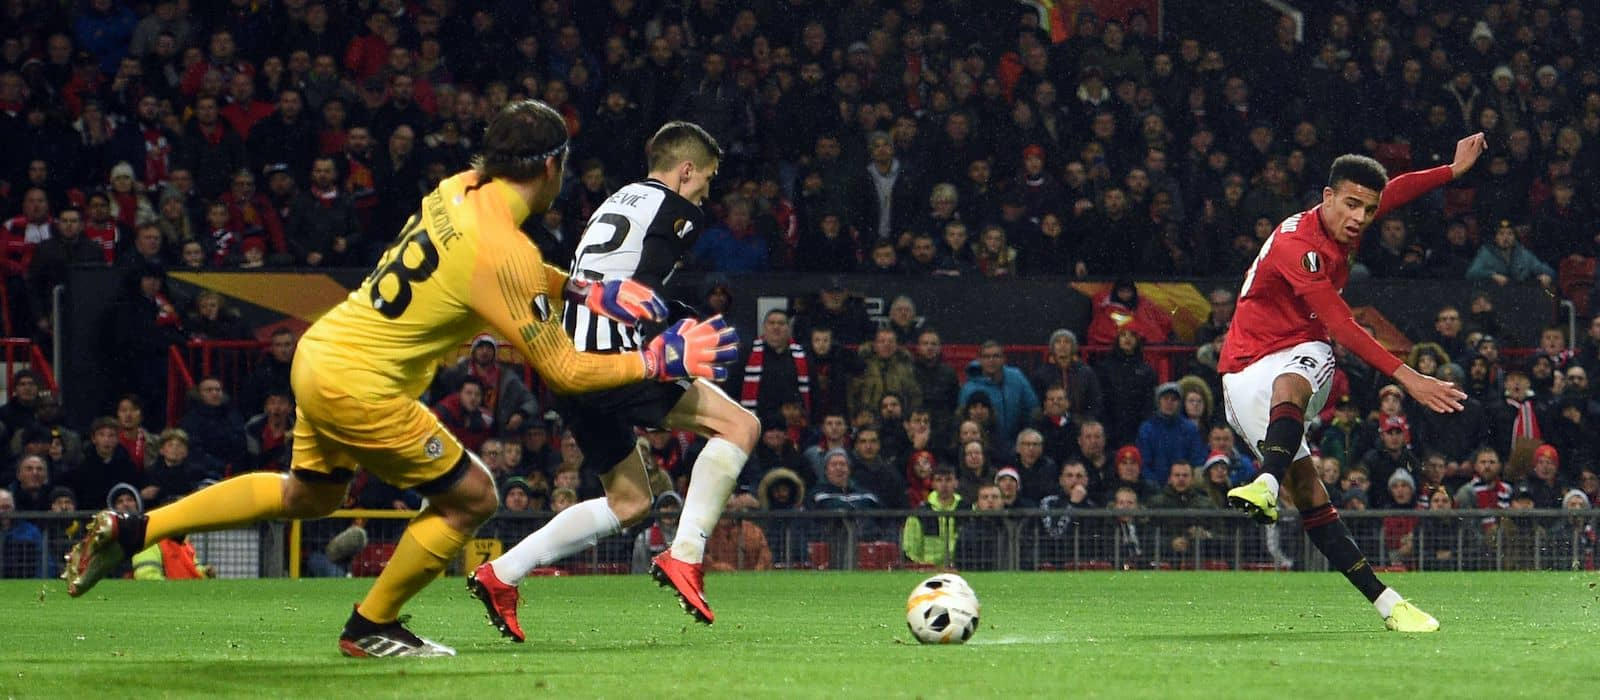 Ole Gunnar Solskjaer: Mason Greenwood must improve before becoming regular starter for Manchester United